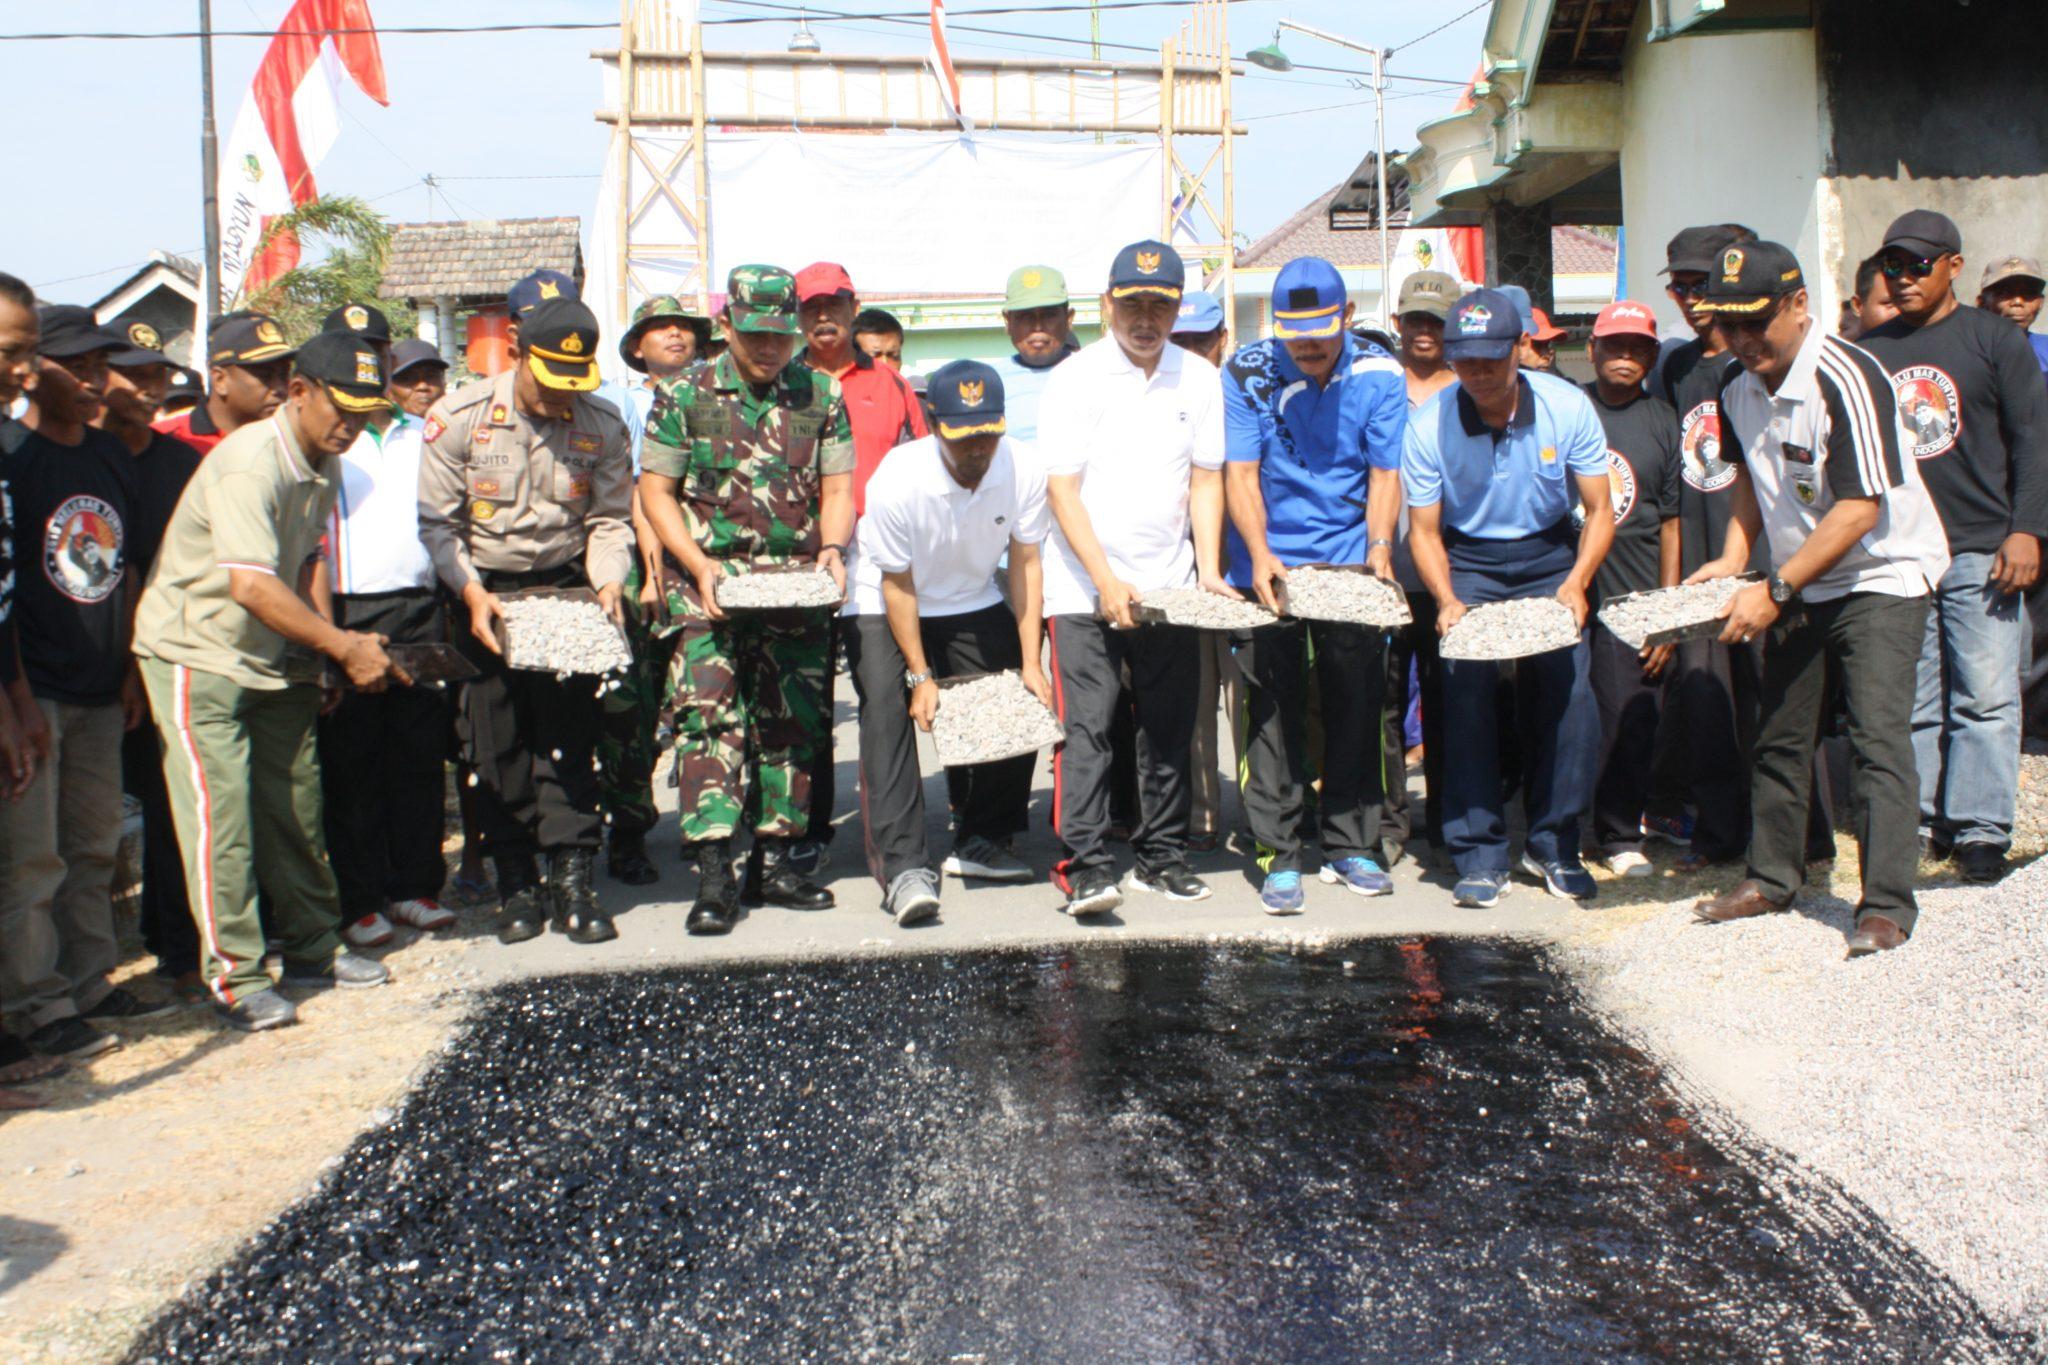 BST Sarana Jalin Keakraban Birokrat Dengan Rakyat Kabupaten Madiun